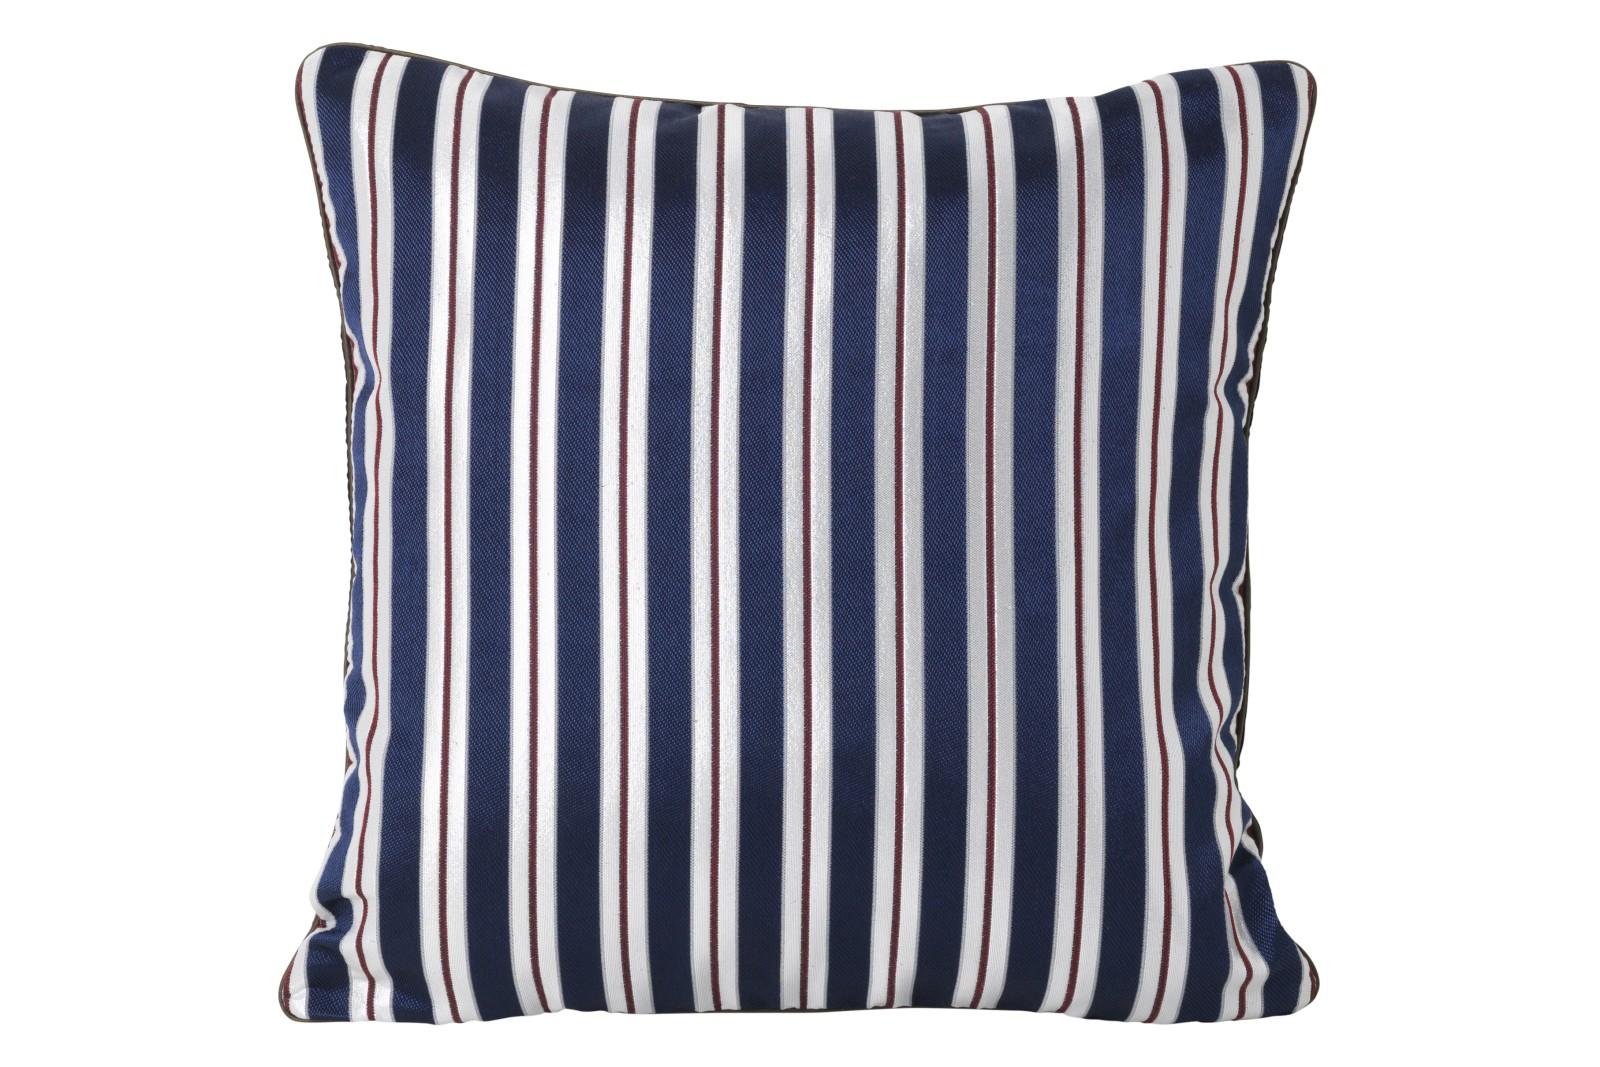 Salon Cushion - Set of 2 Pinstripe, 40 x 40 cm